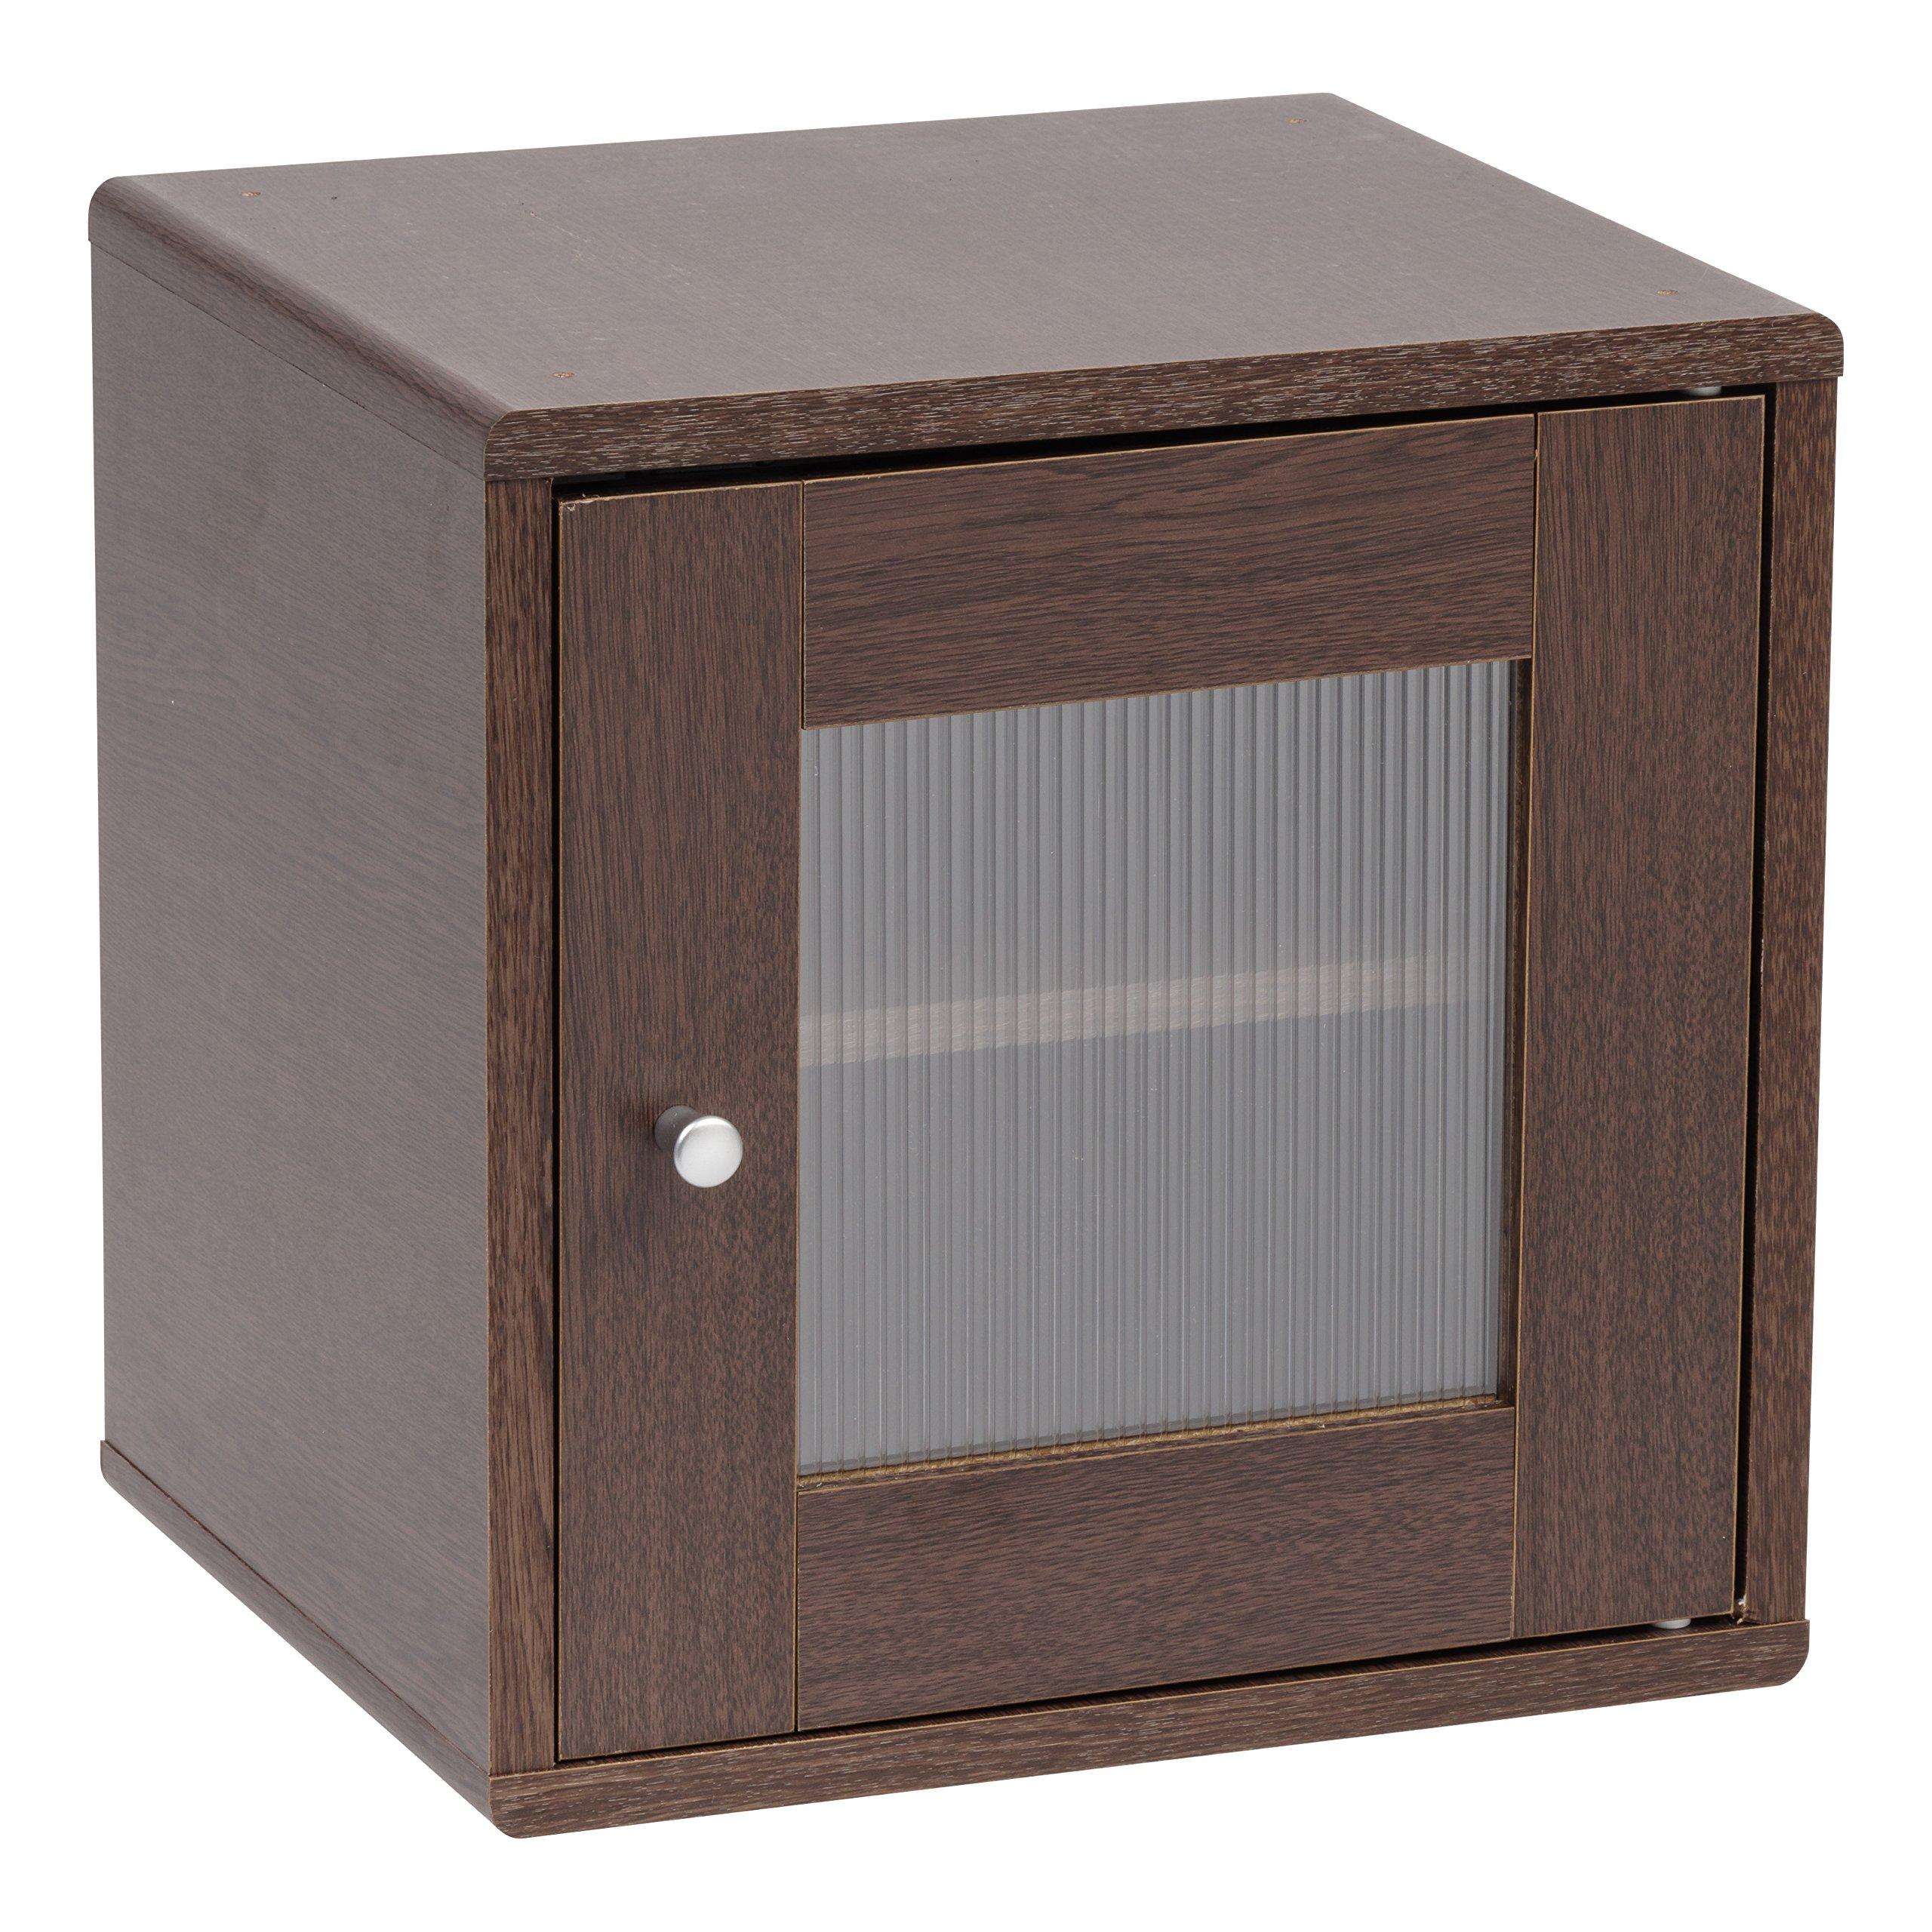 IRIS USA, QR-34PDT, Wood Storage Cube with Window Door, Brown Oak, 1 Pack